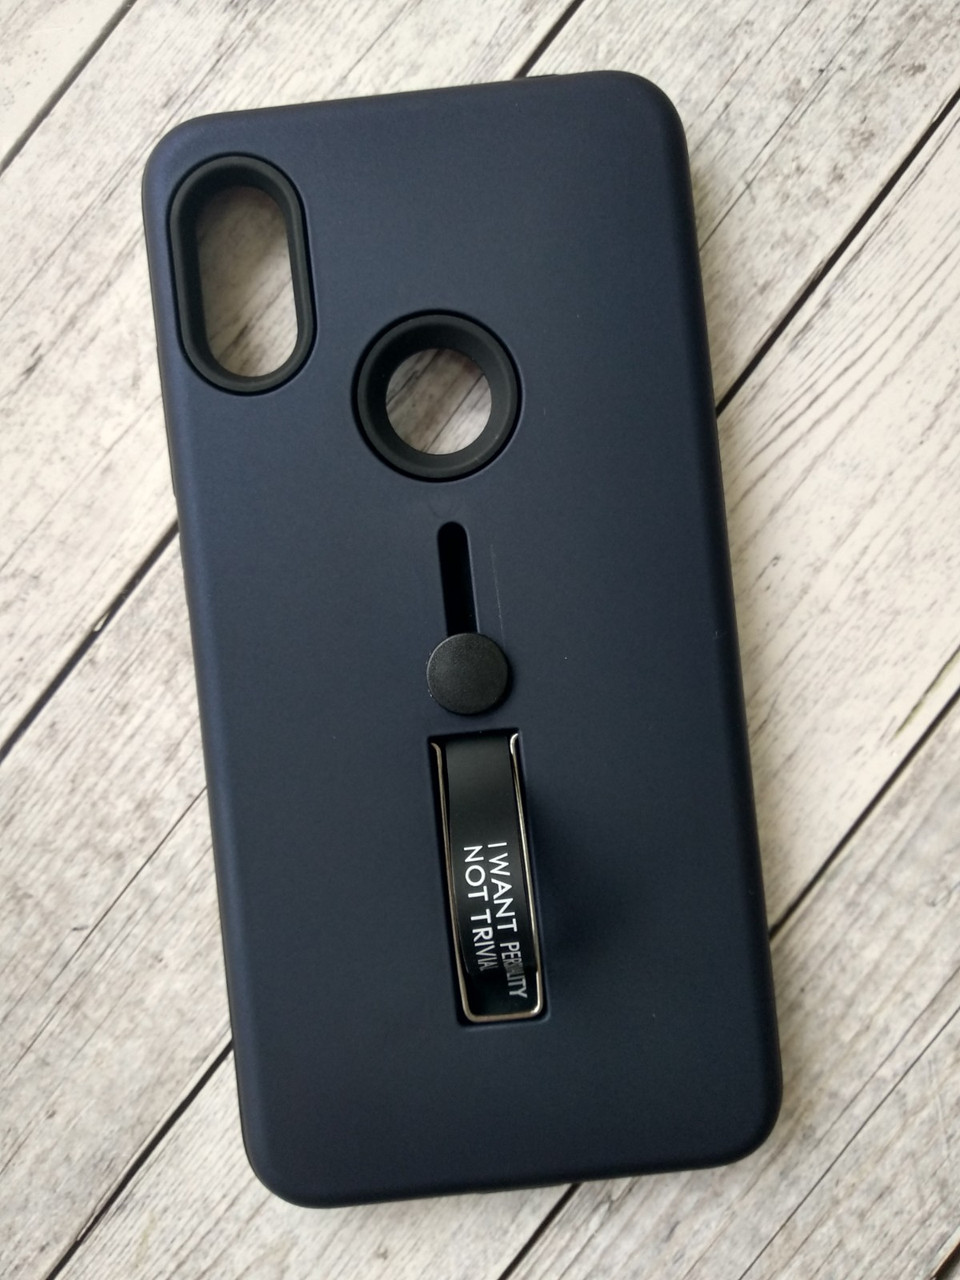 Чехол для Xiaomi Redmi 6Pro/Mi A2 Lite Silicone + Plastic Finger Ring Stand dark blue